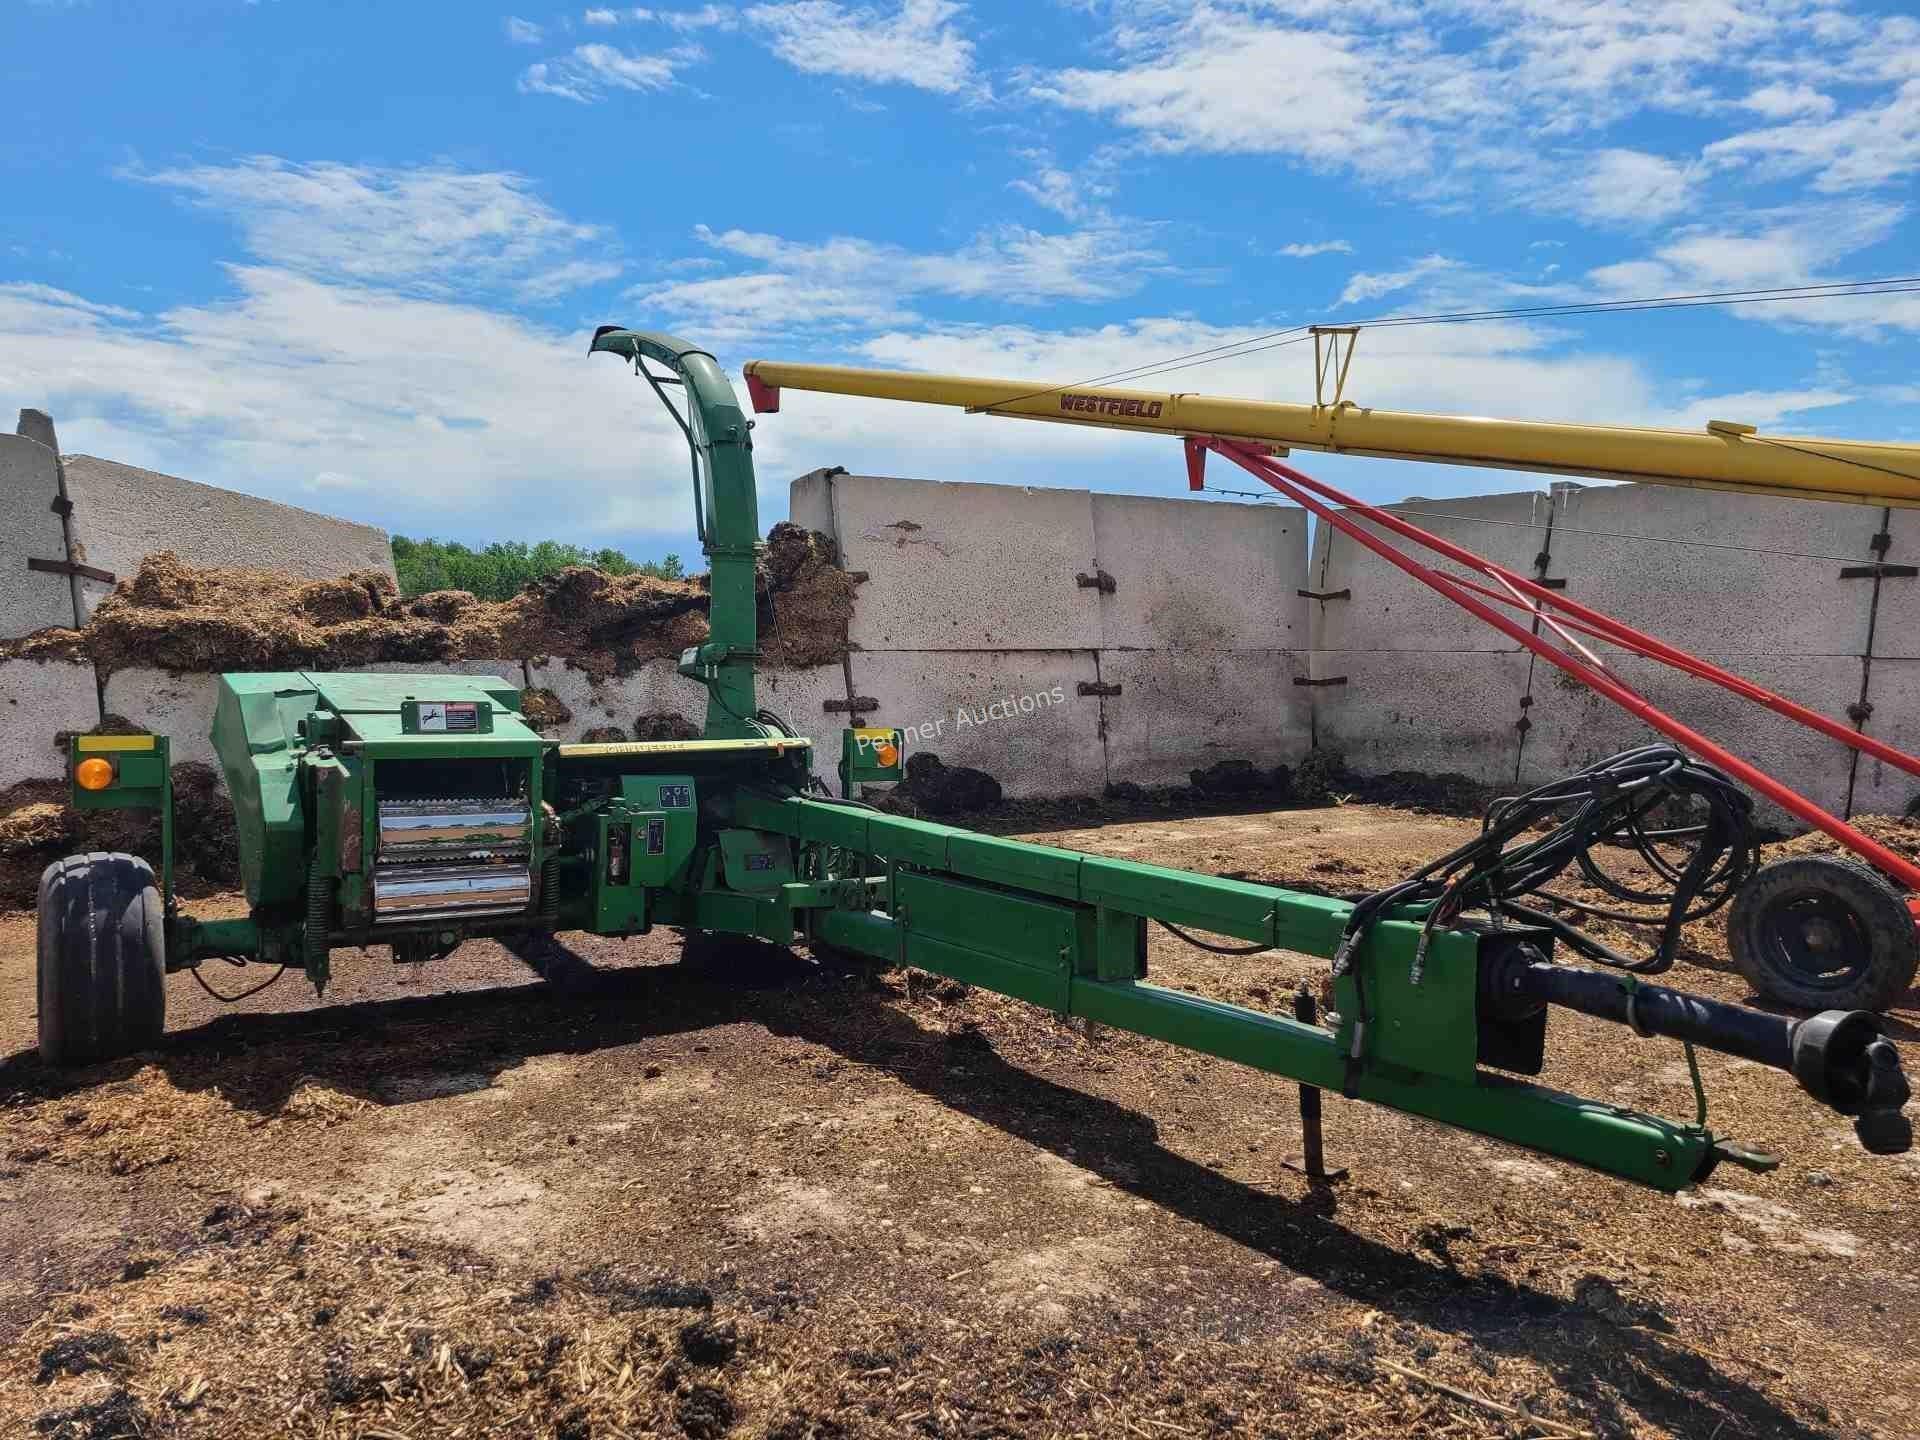 John Deere 3975 Forage Harvester